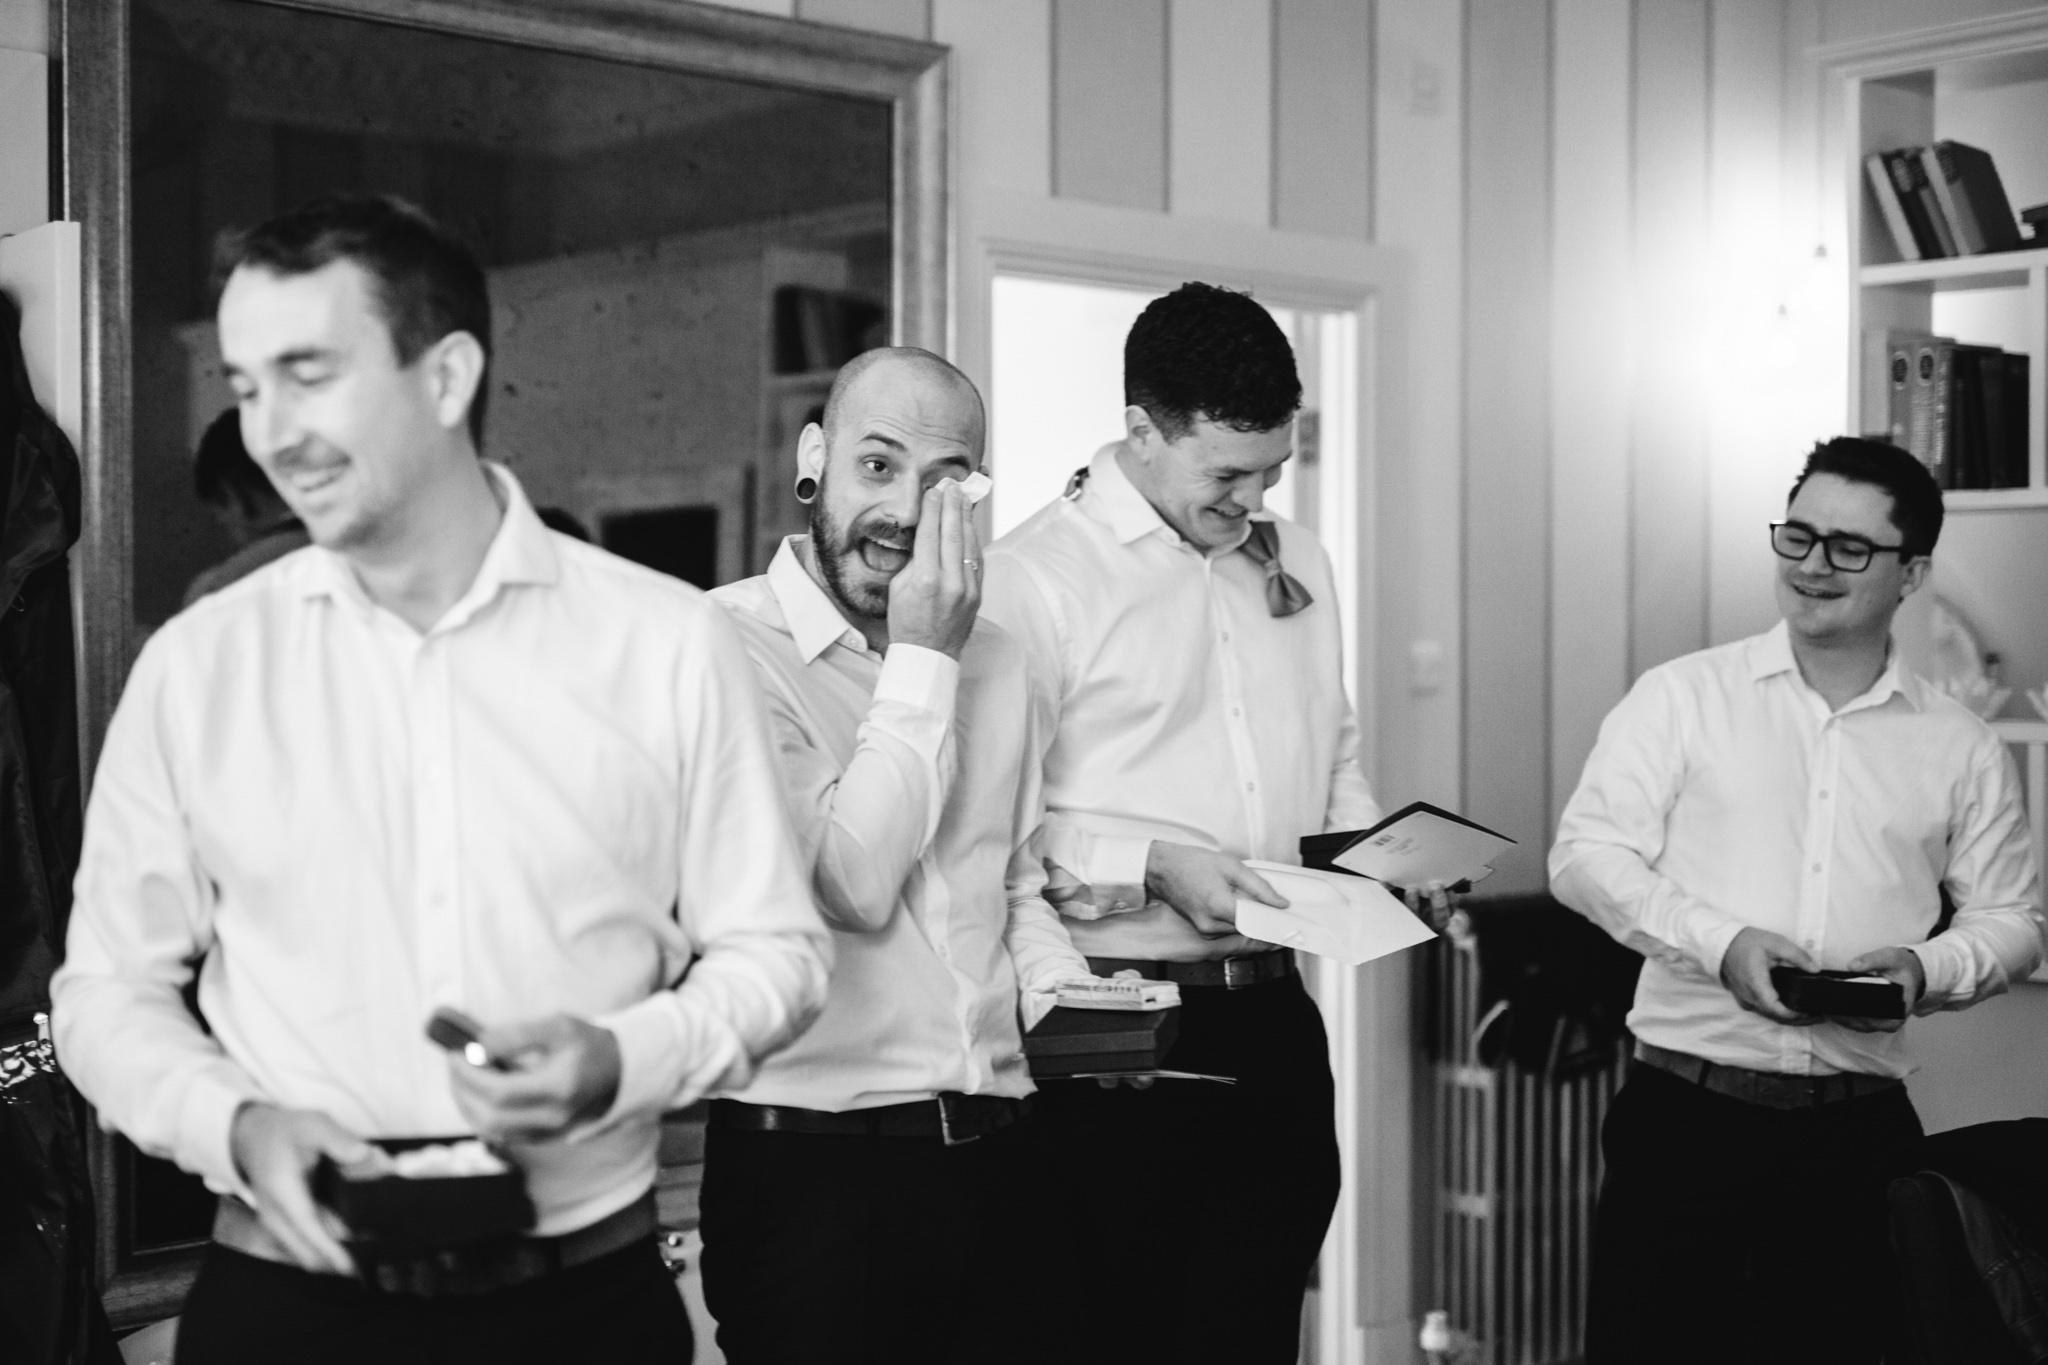 didsbury-house-hotel-wedding-photography--4.jpg